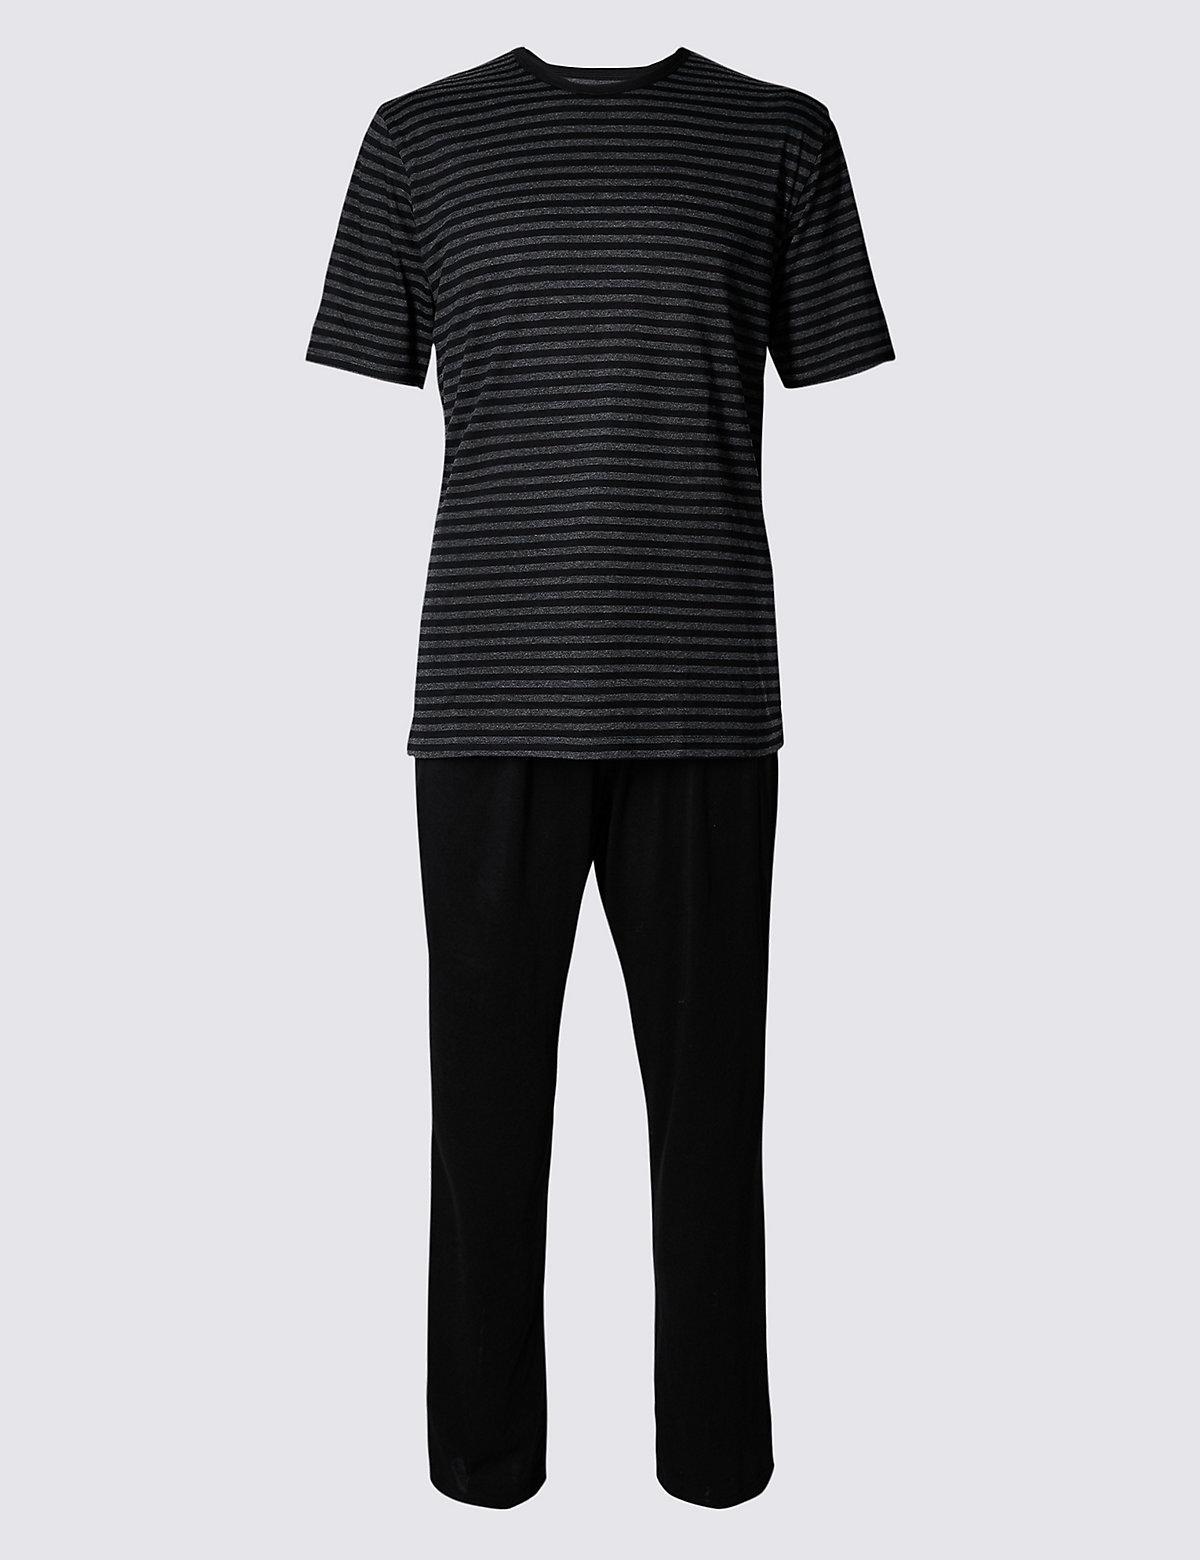 M&S Collection Cotton Rich Striped Pyjama Set